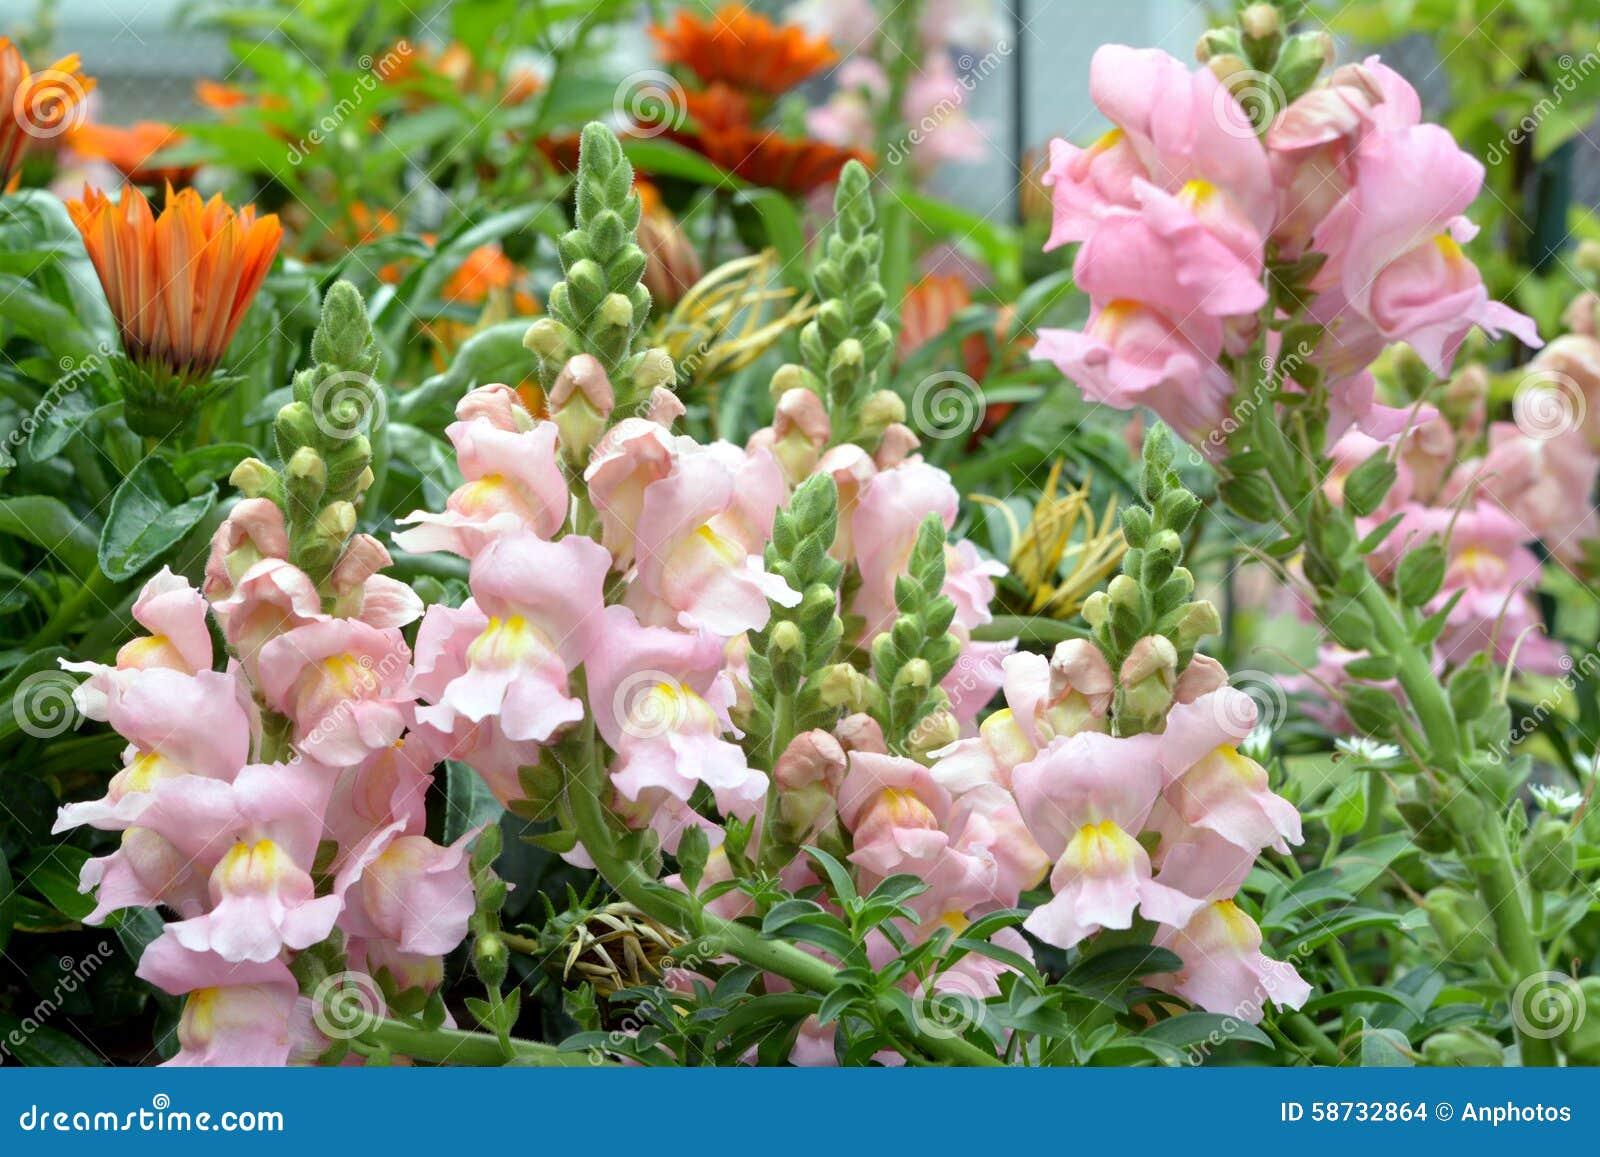 Pink Snapdragon Flower Stock Photo Image Of Dragon Flower 58732864